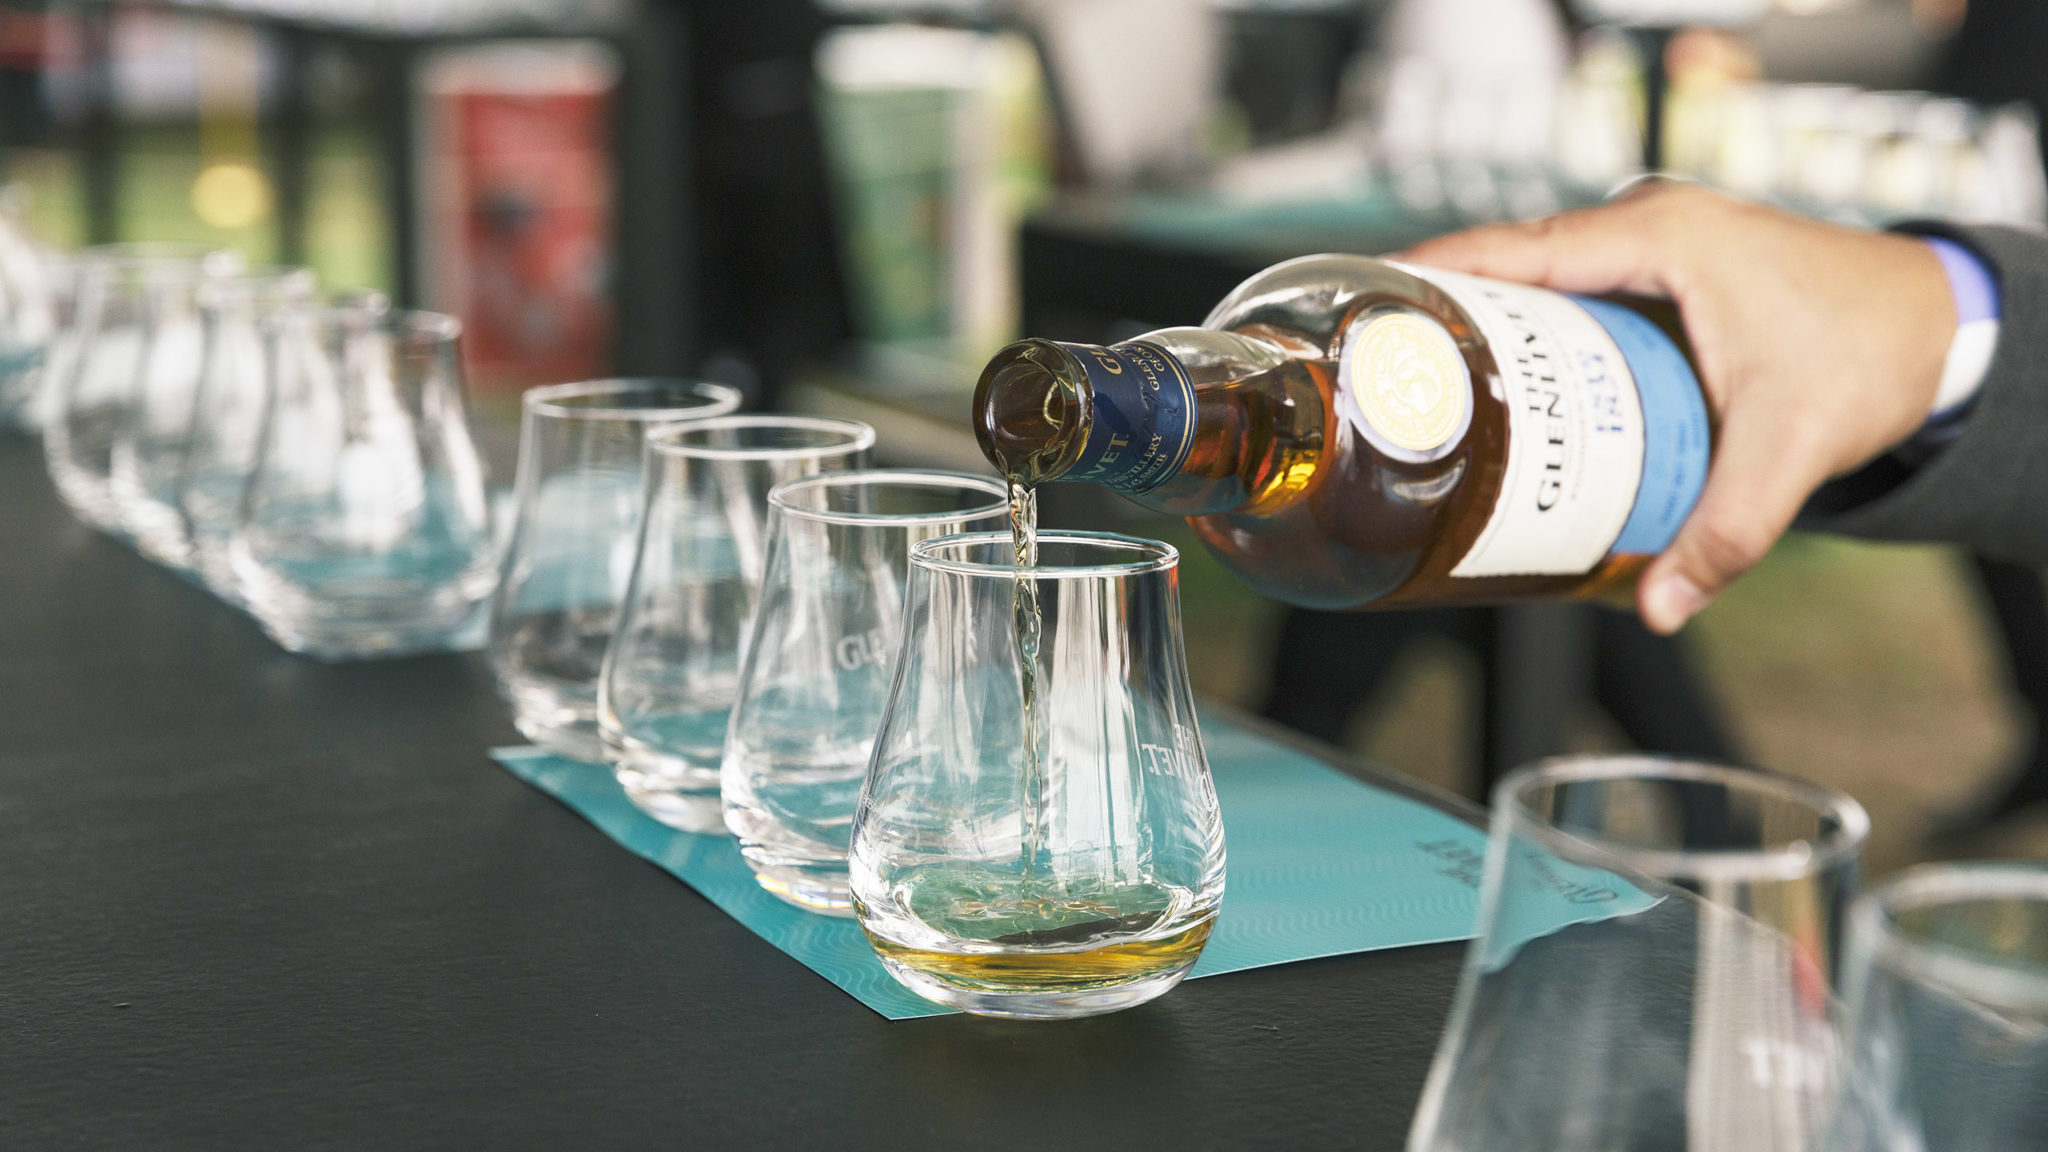 Glenlivet, whisky, The Glenlivet